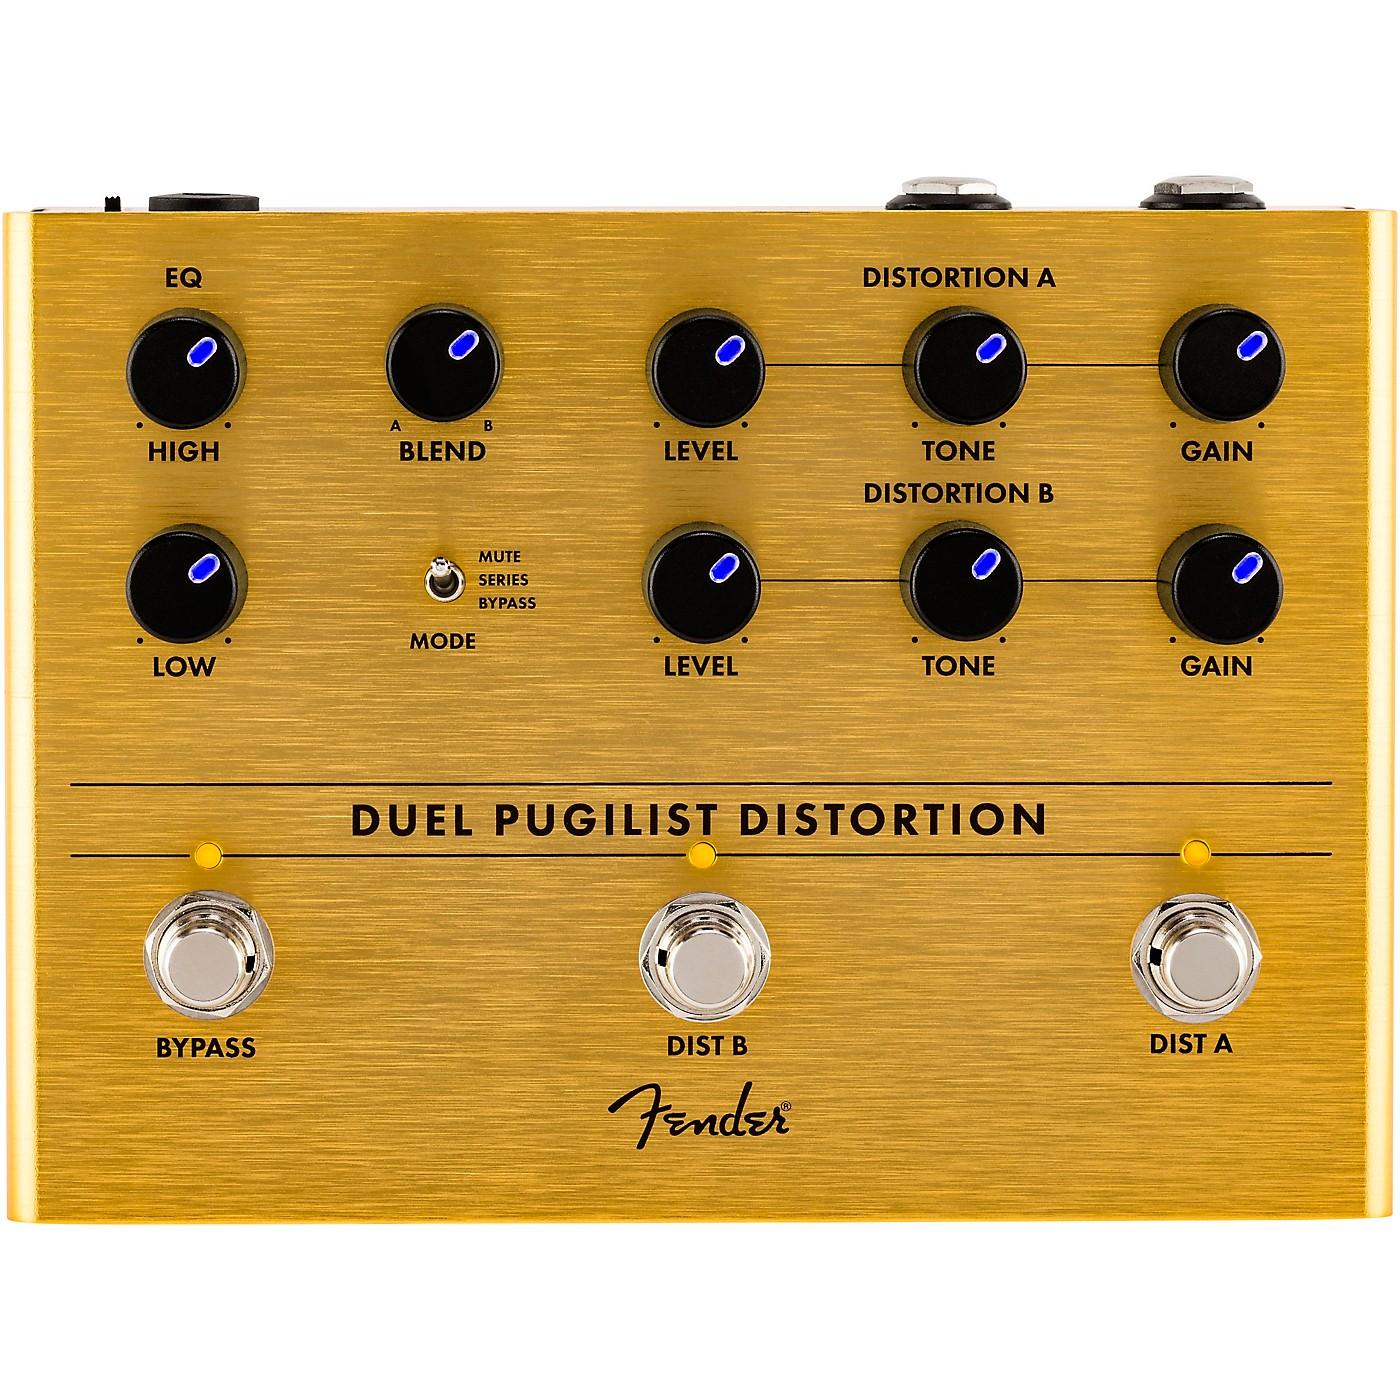 Fender Duel Pugilist Distortion Effects Pedal thumbnail